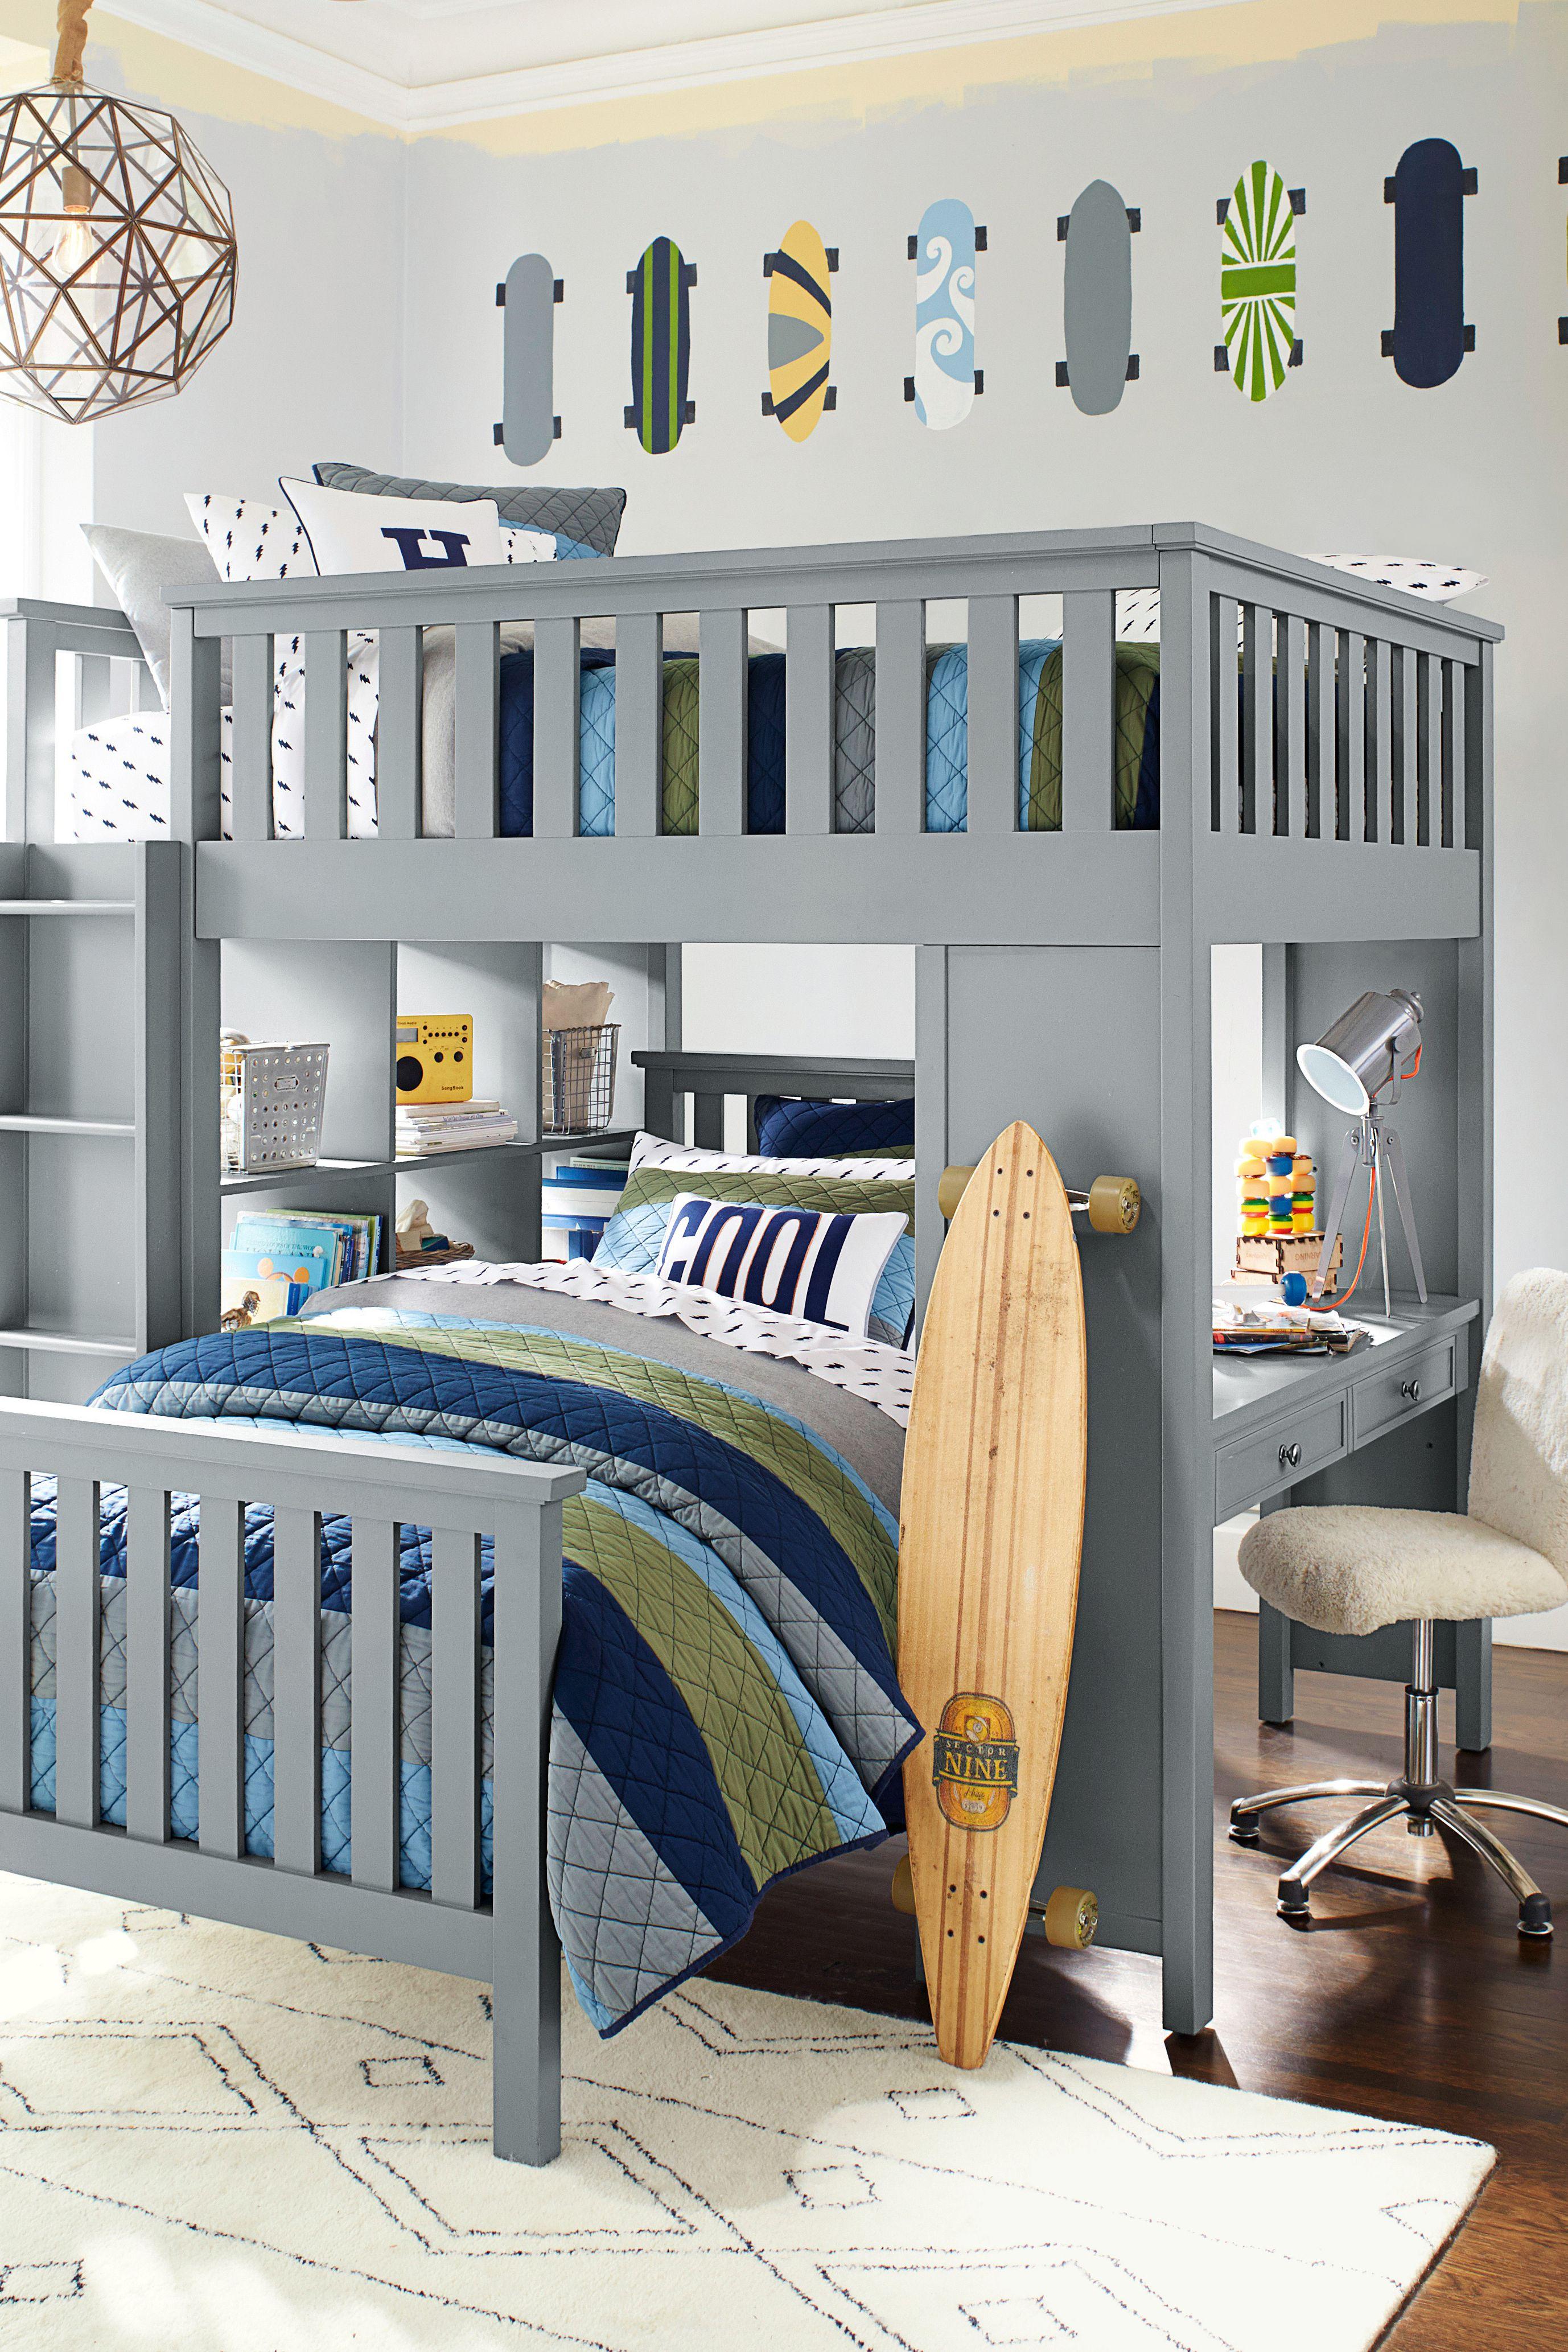 Bunk Beds Bunk Beds For Kids Kids Bunk Beds Bunk Beds For Boys Room Cool Bunk Beds Bunk Bed Designs